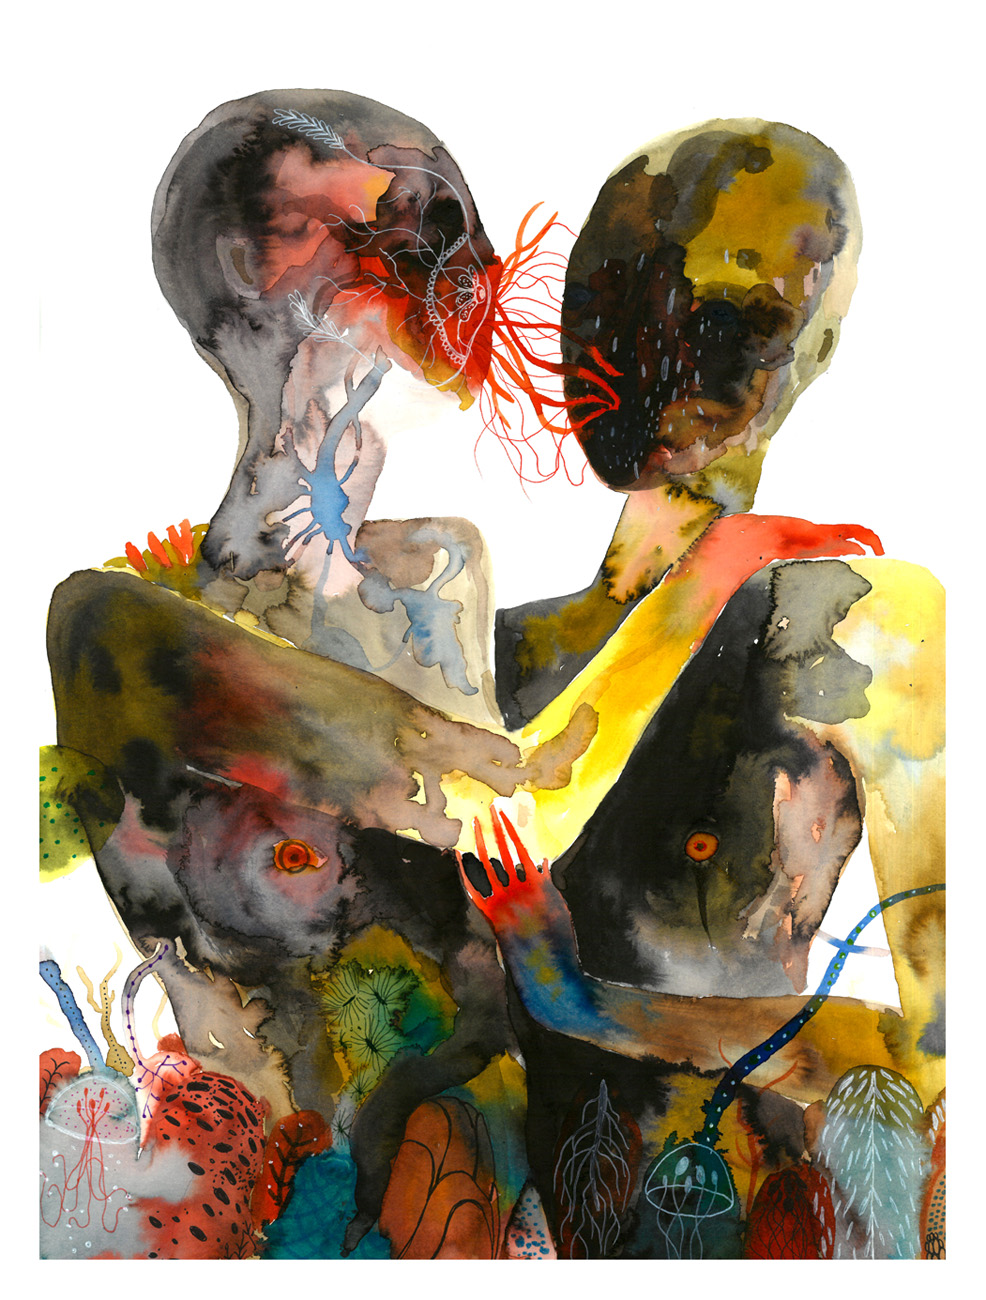 Le-nevralgie-costanti-visual atelier8-3.jpg